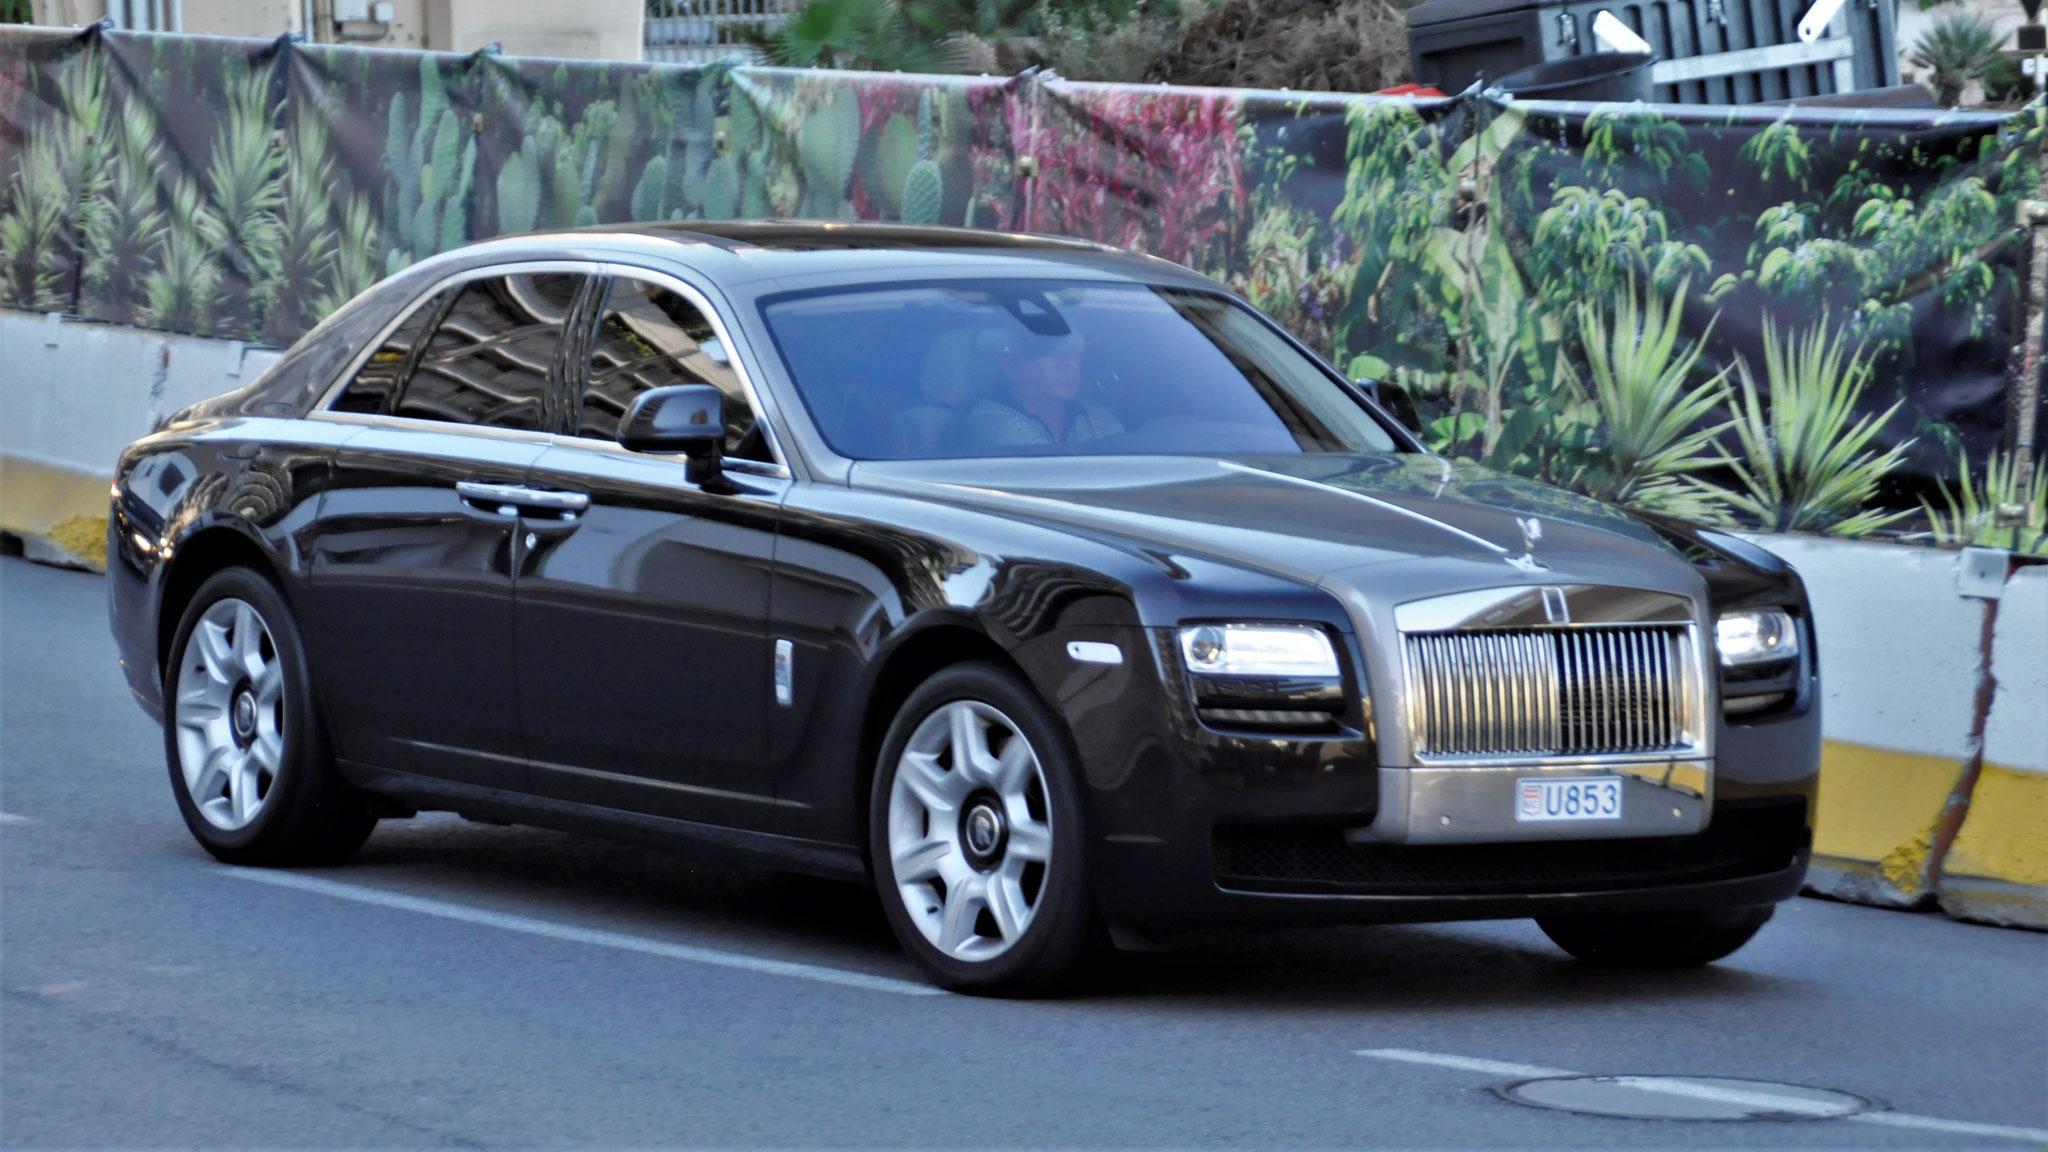 Rolls Royce Ghost - U853 (MC)